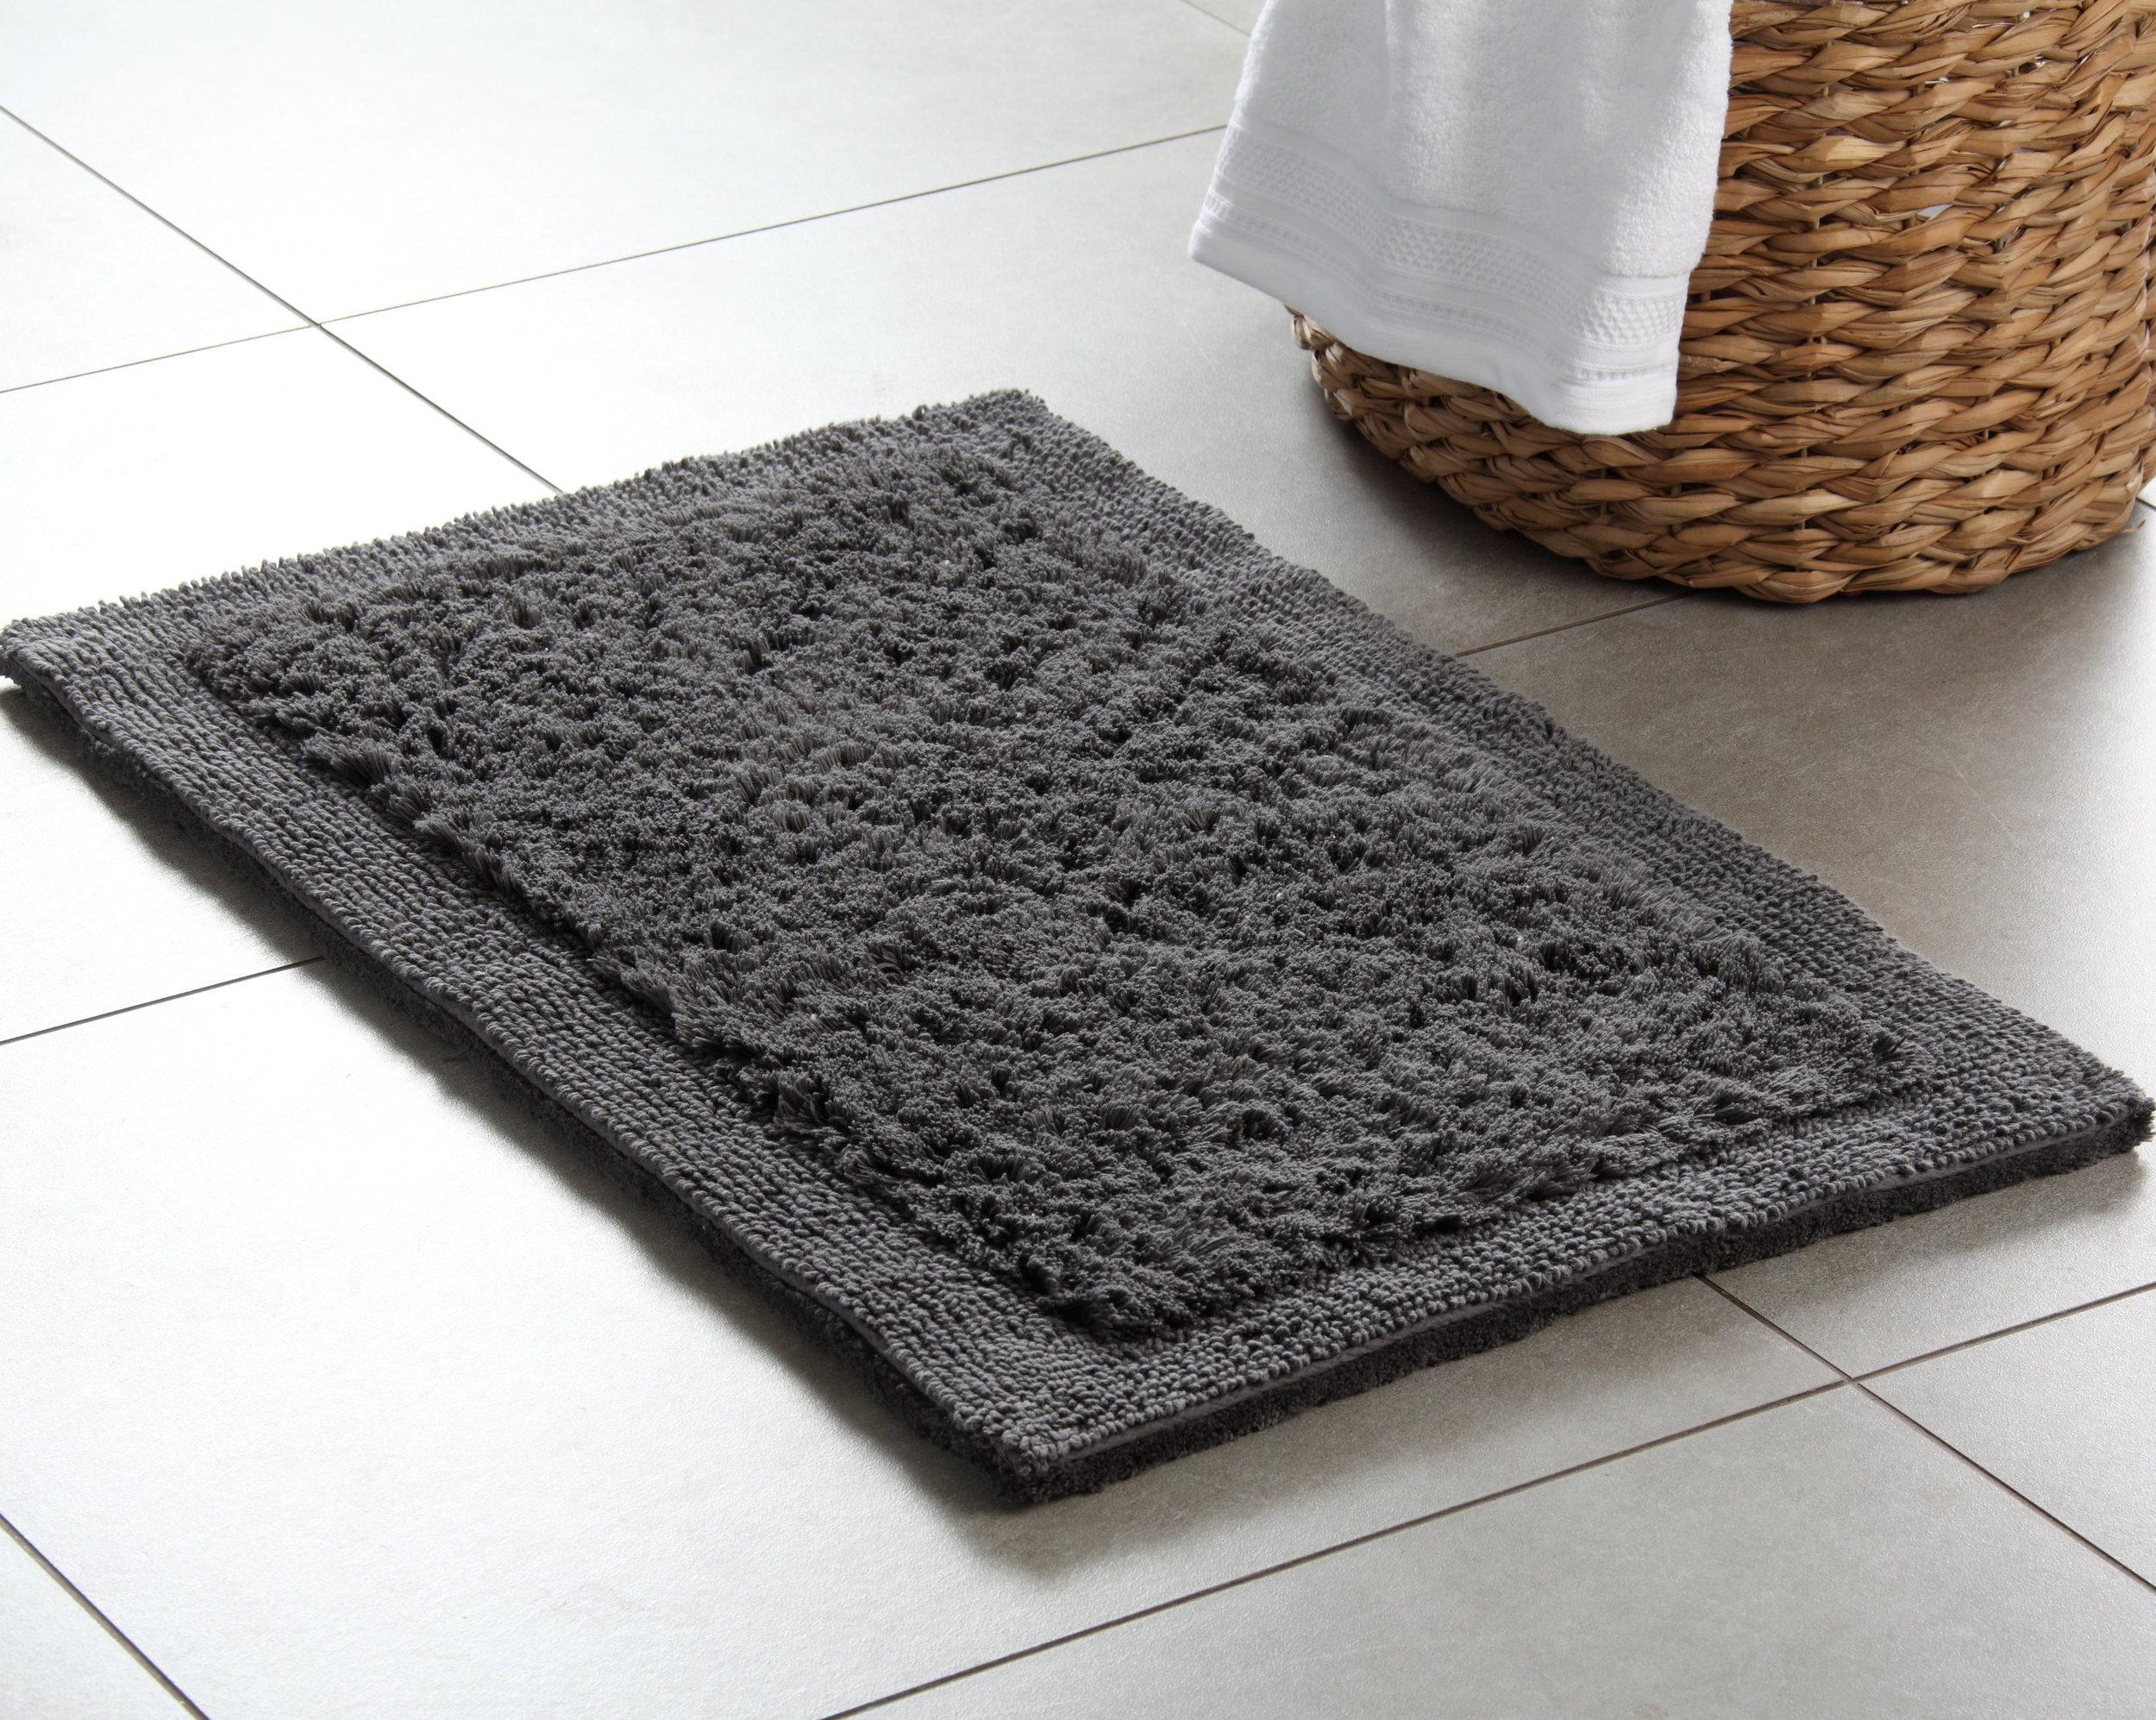 Domani Organic Bathmat Charcoal.jpg